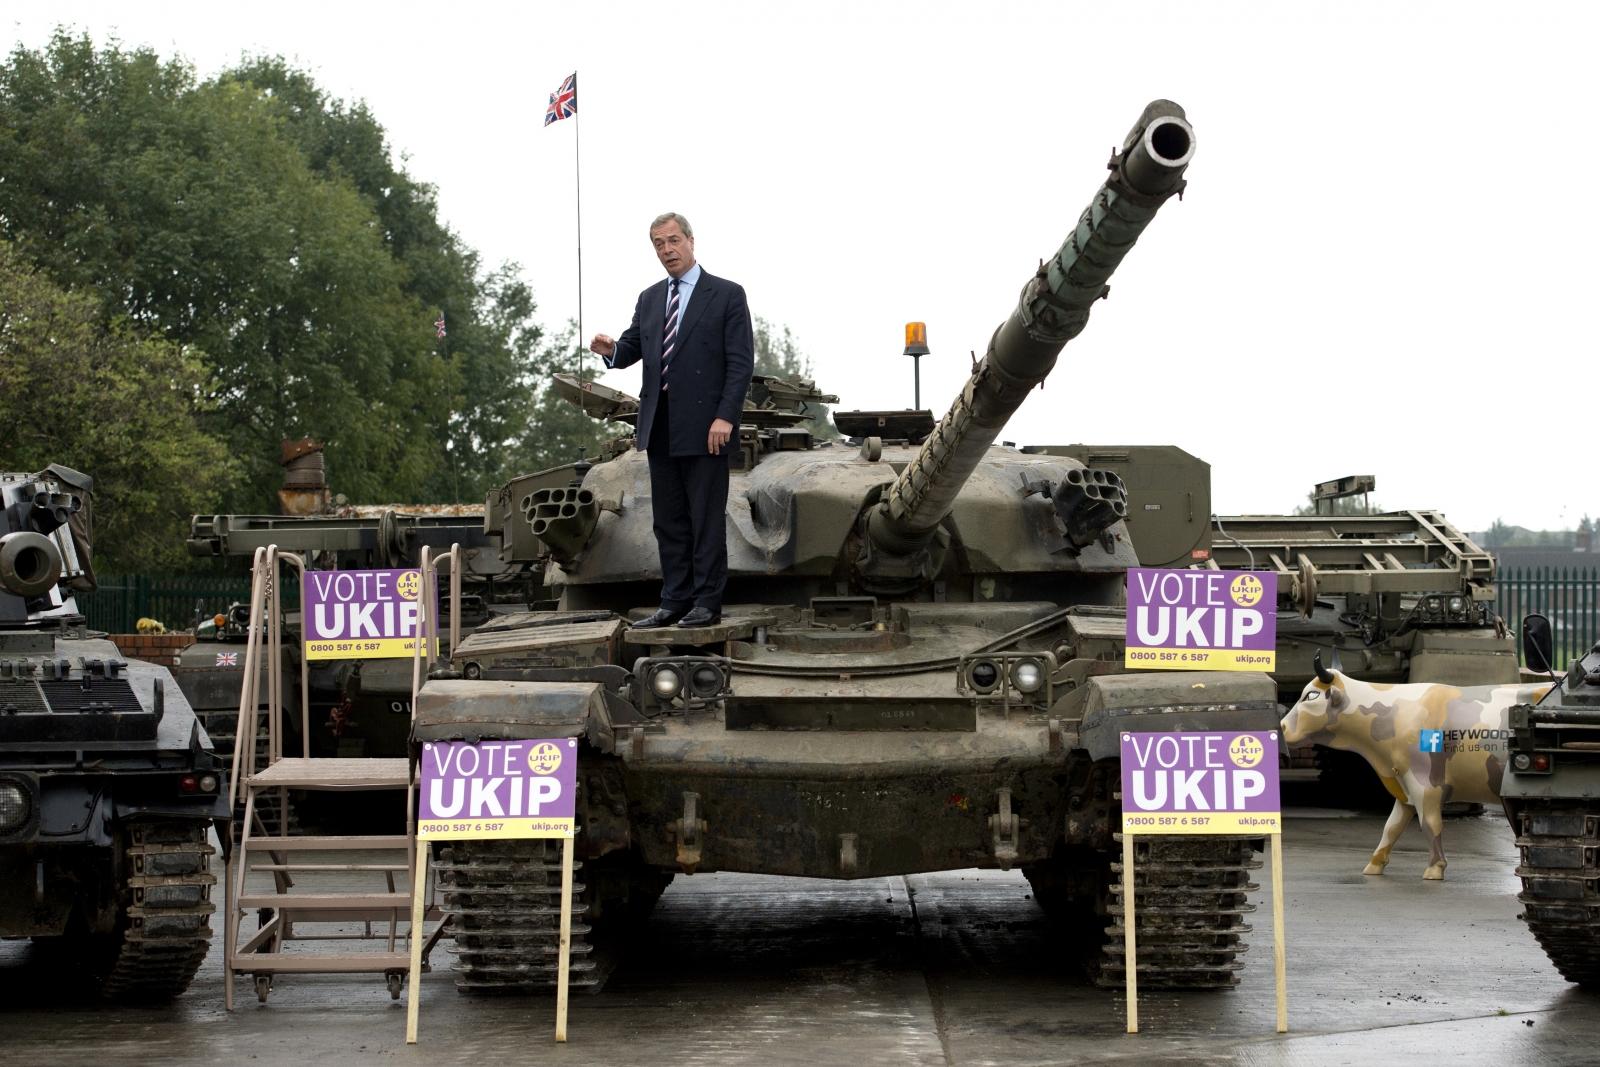 Nigel Farage tank